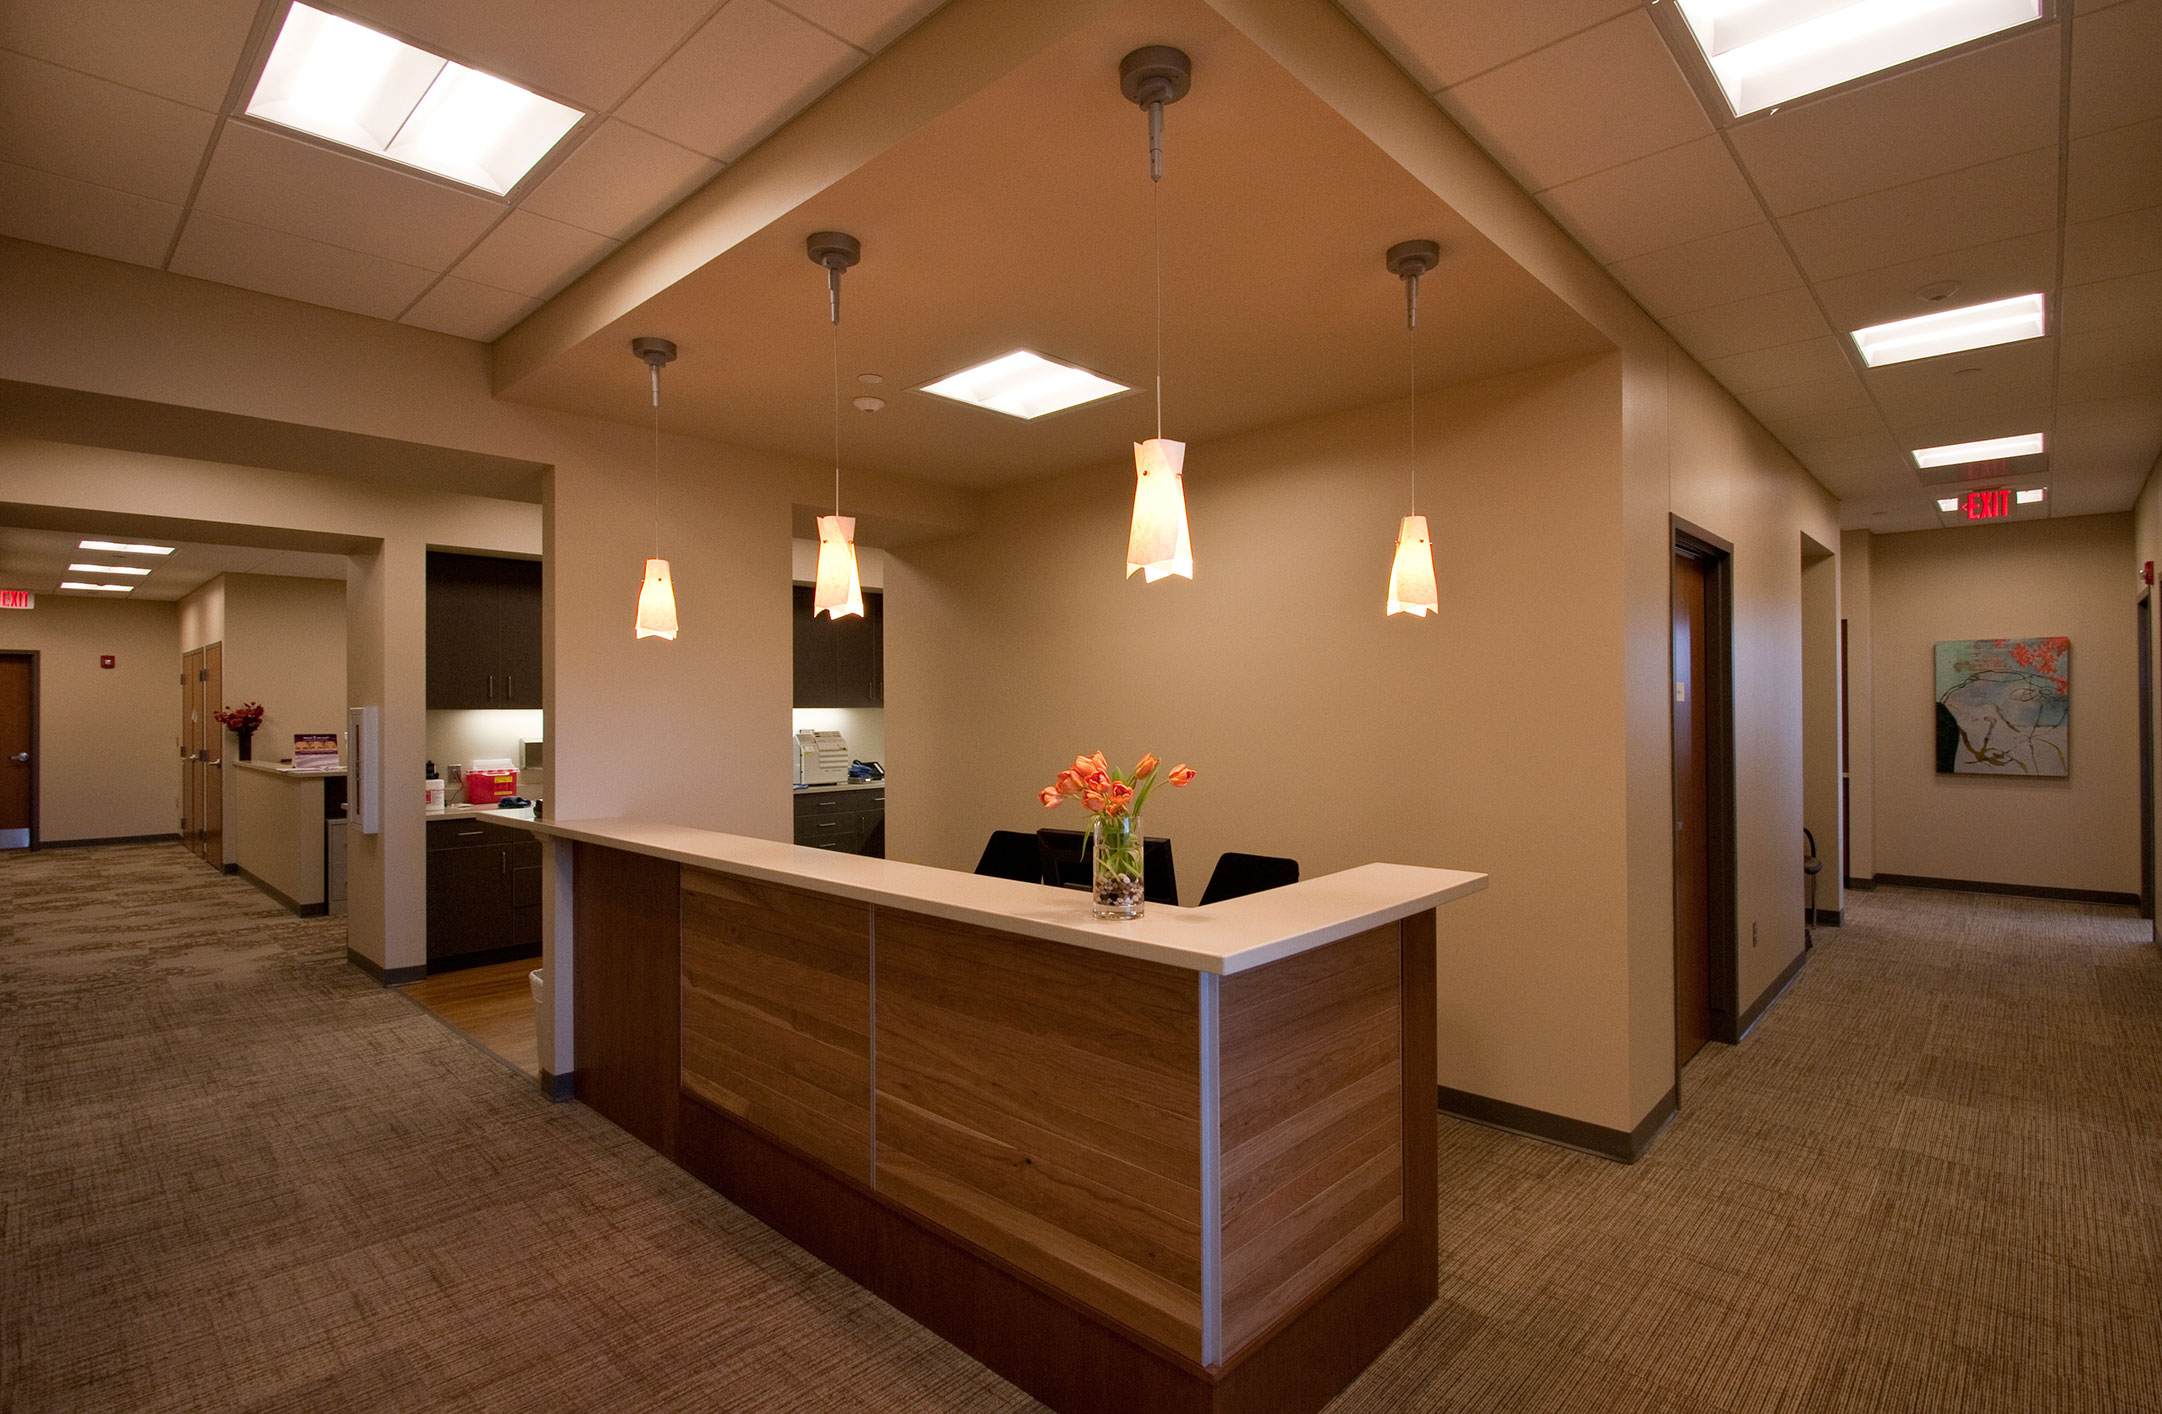 Westfield Plastic Surgery Center     Omaha, NE   View Gallery »